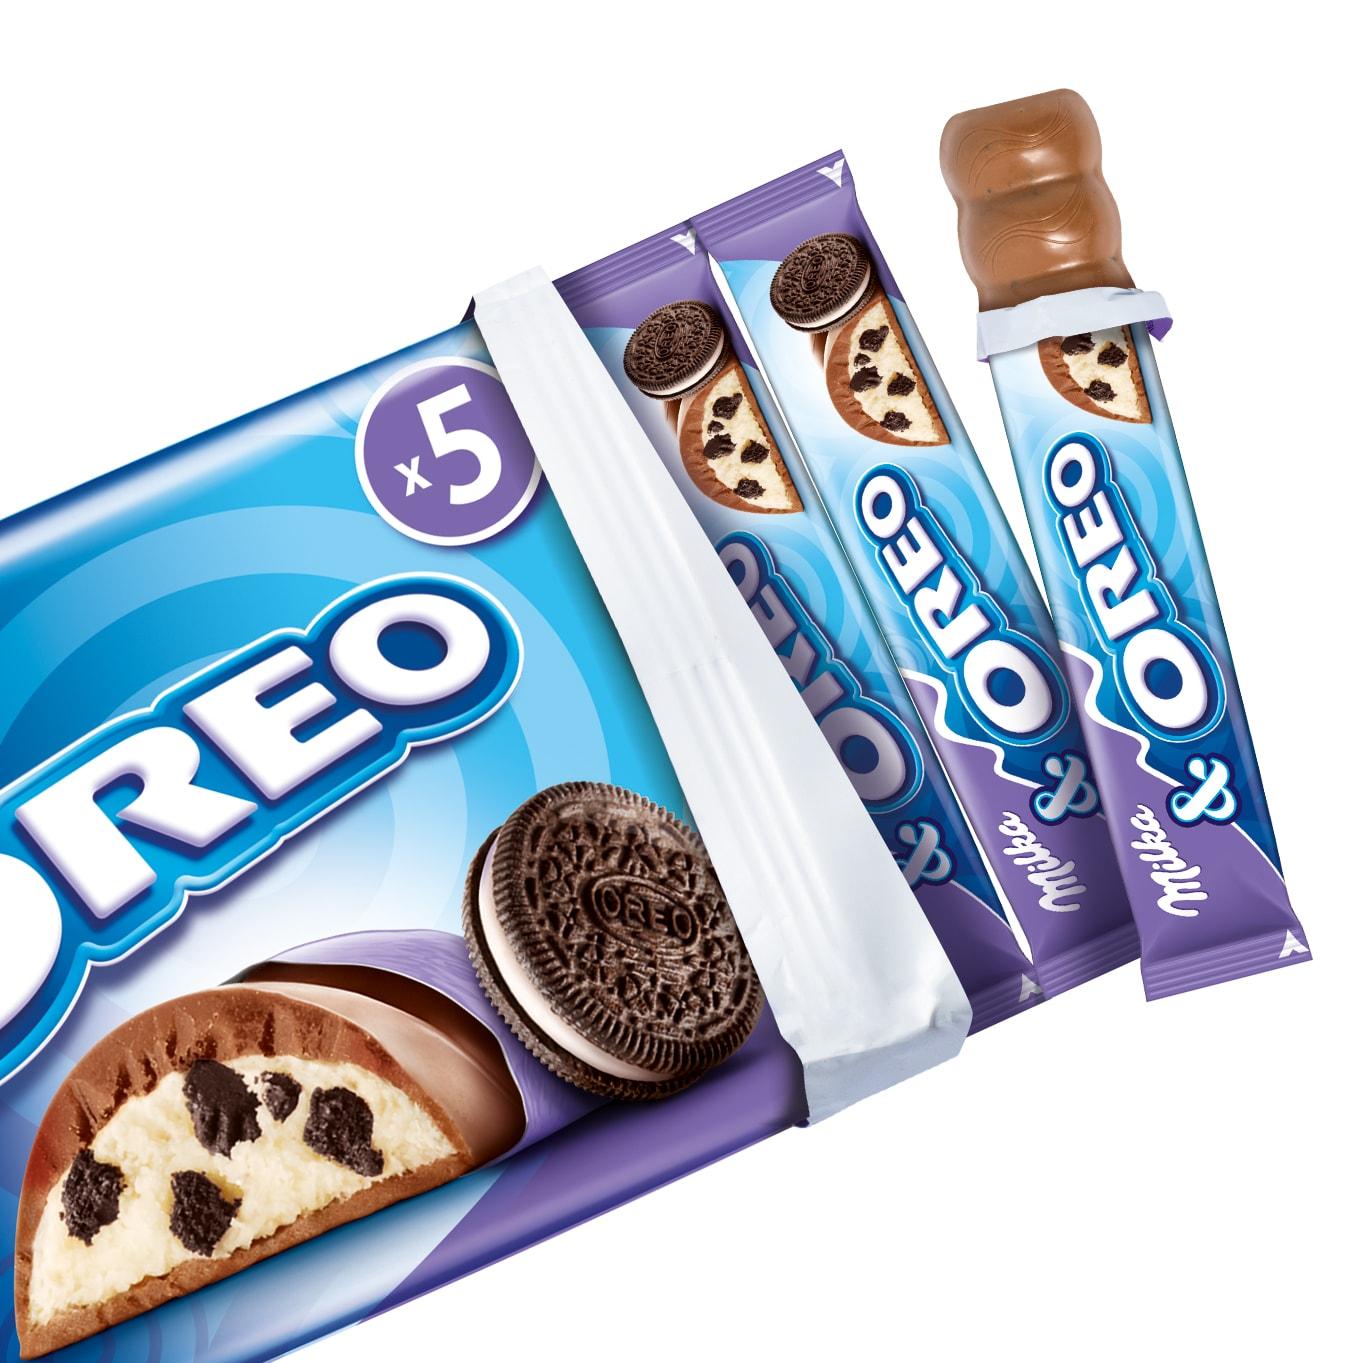 Milka Oreo Riegel 185g 5 Stuck Bei Rewe Online Bestellen